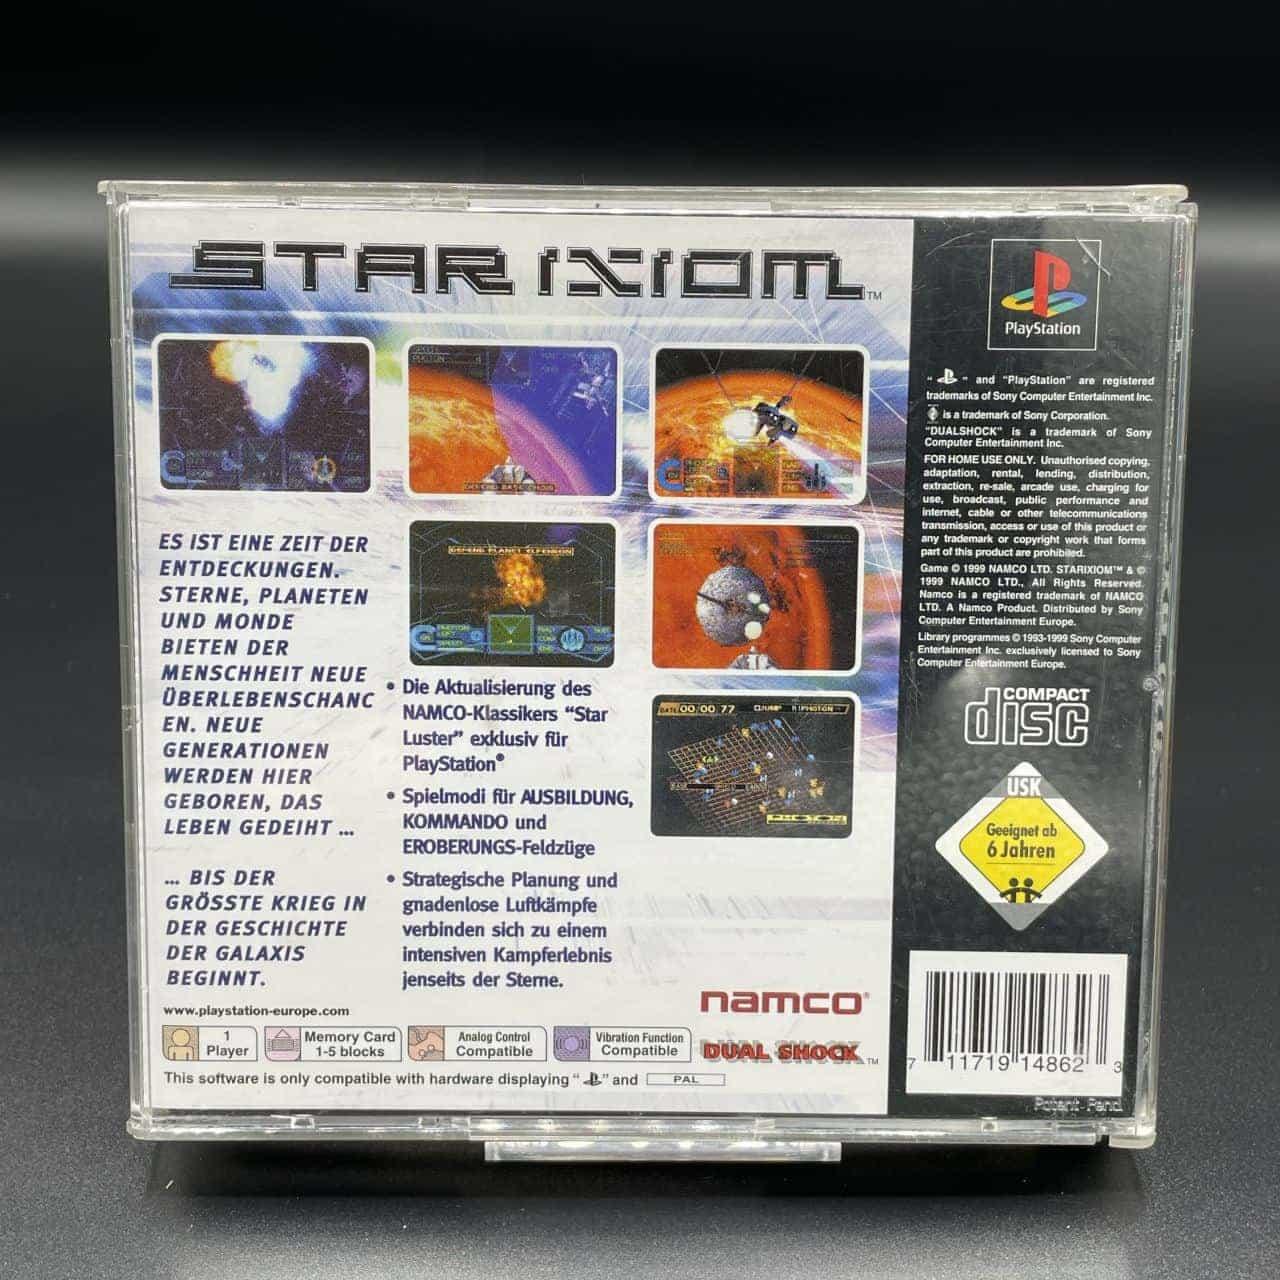 PS1 Star Ixiom (Komplett) (Gebrauchsspuren) Sony PlayStation 1